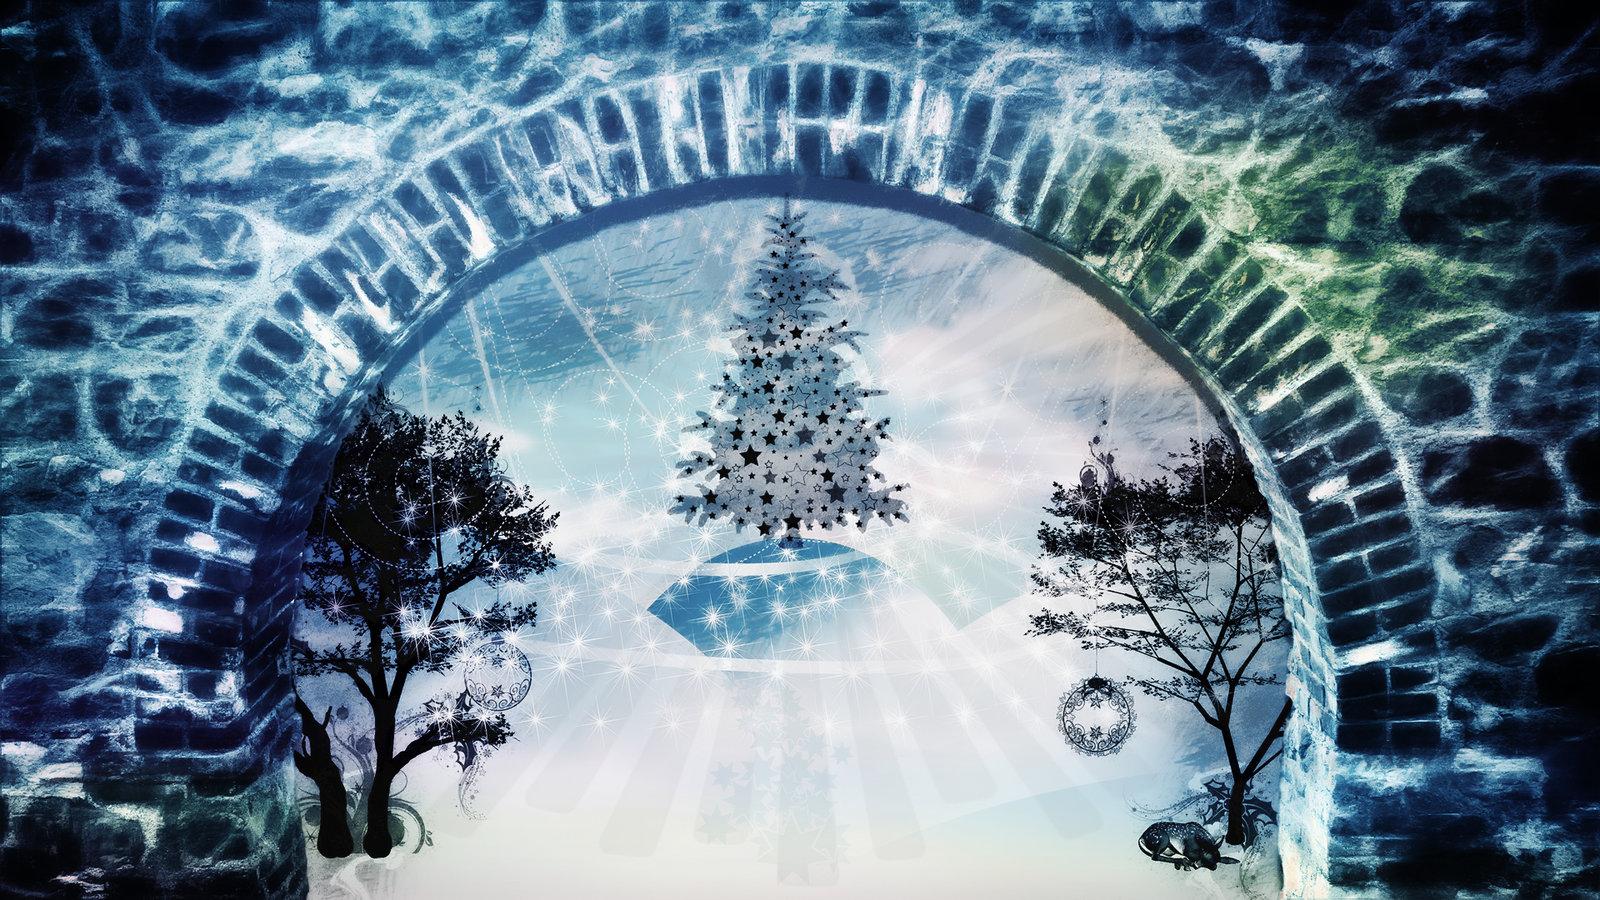 winter_dreams_by_kalca-d4jdprz